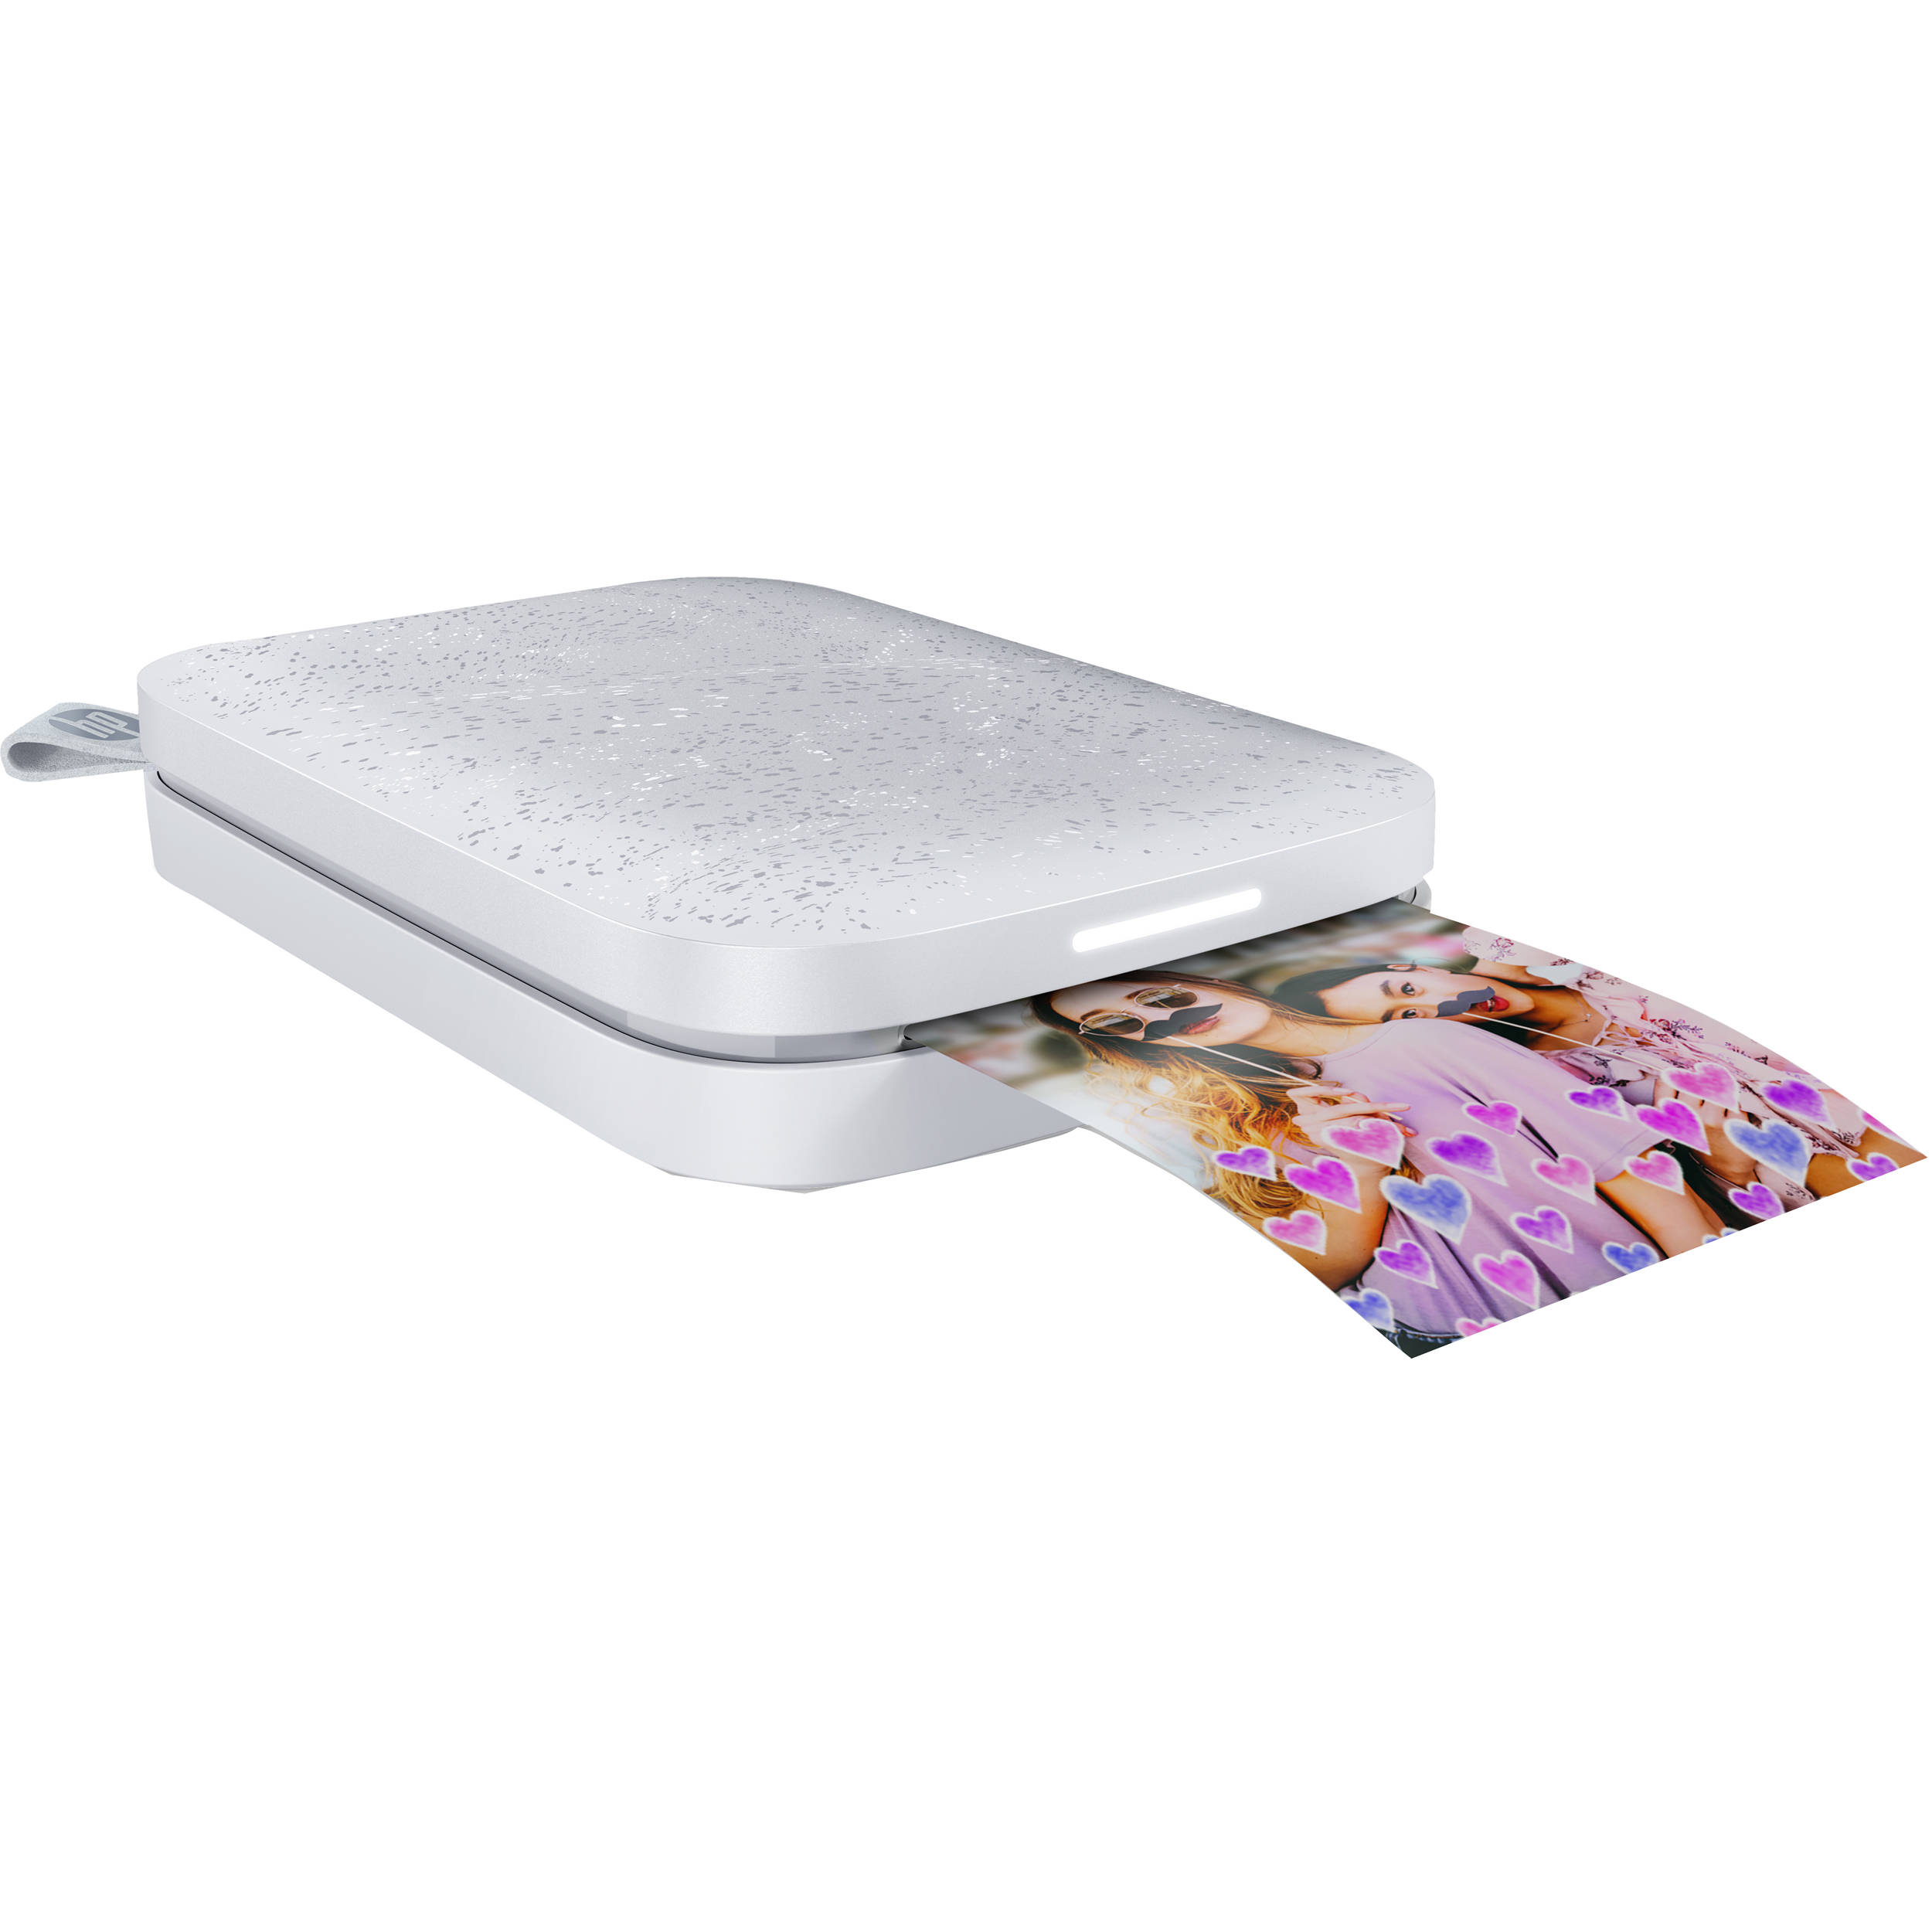 Zink Paper Bundle HP Sprocket Portable 2x3 Instant Photo Printer Luna Pearl